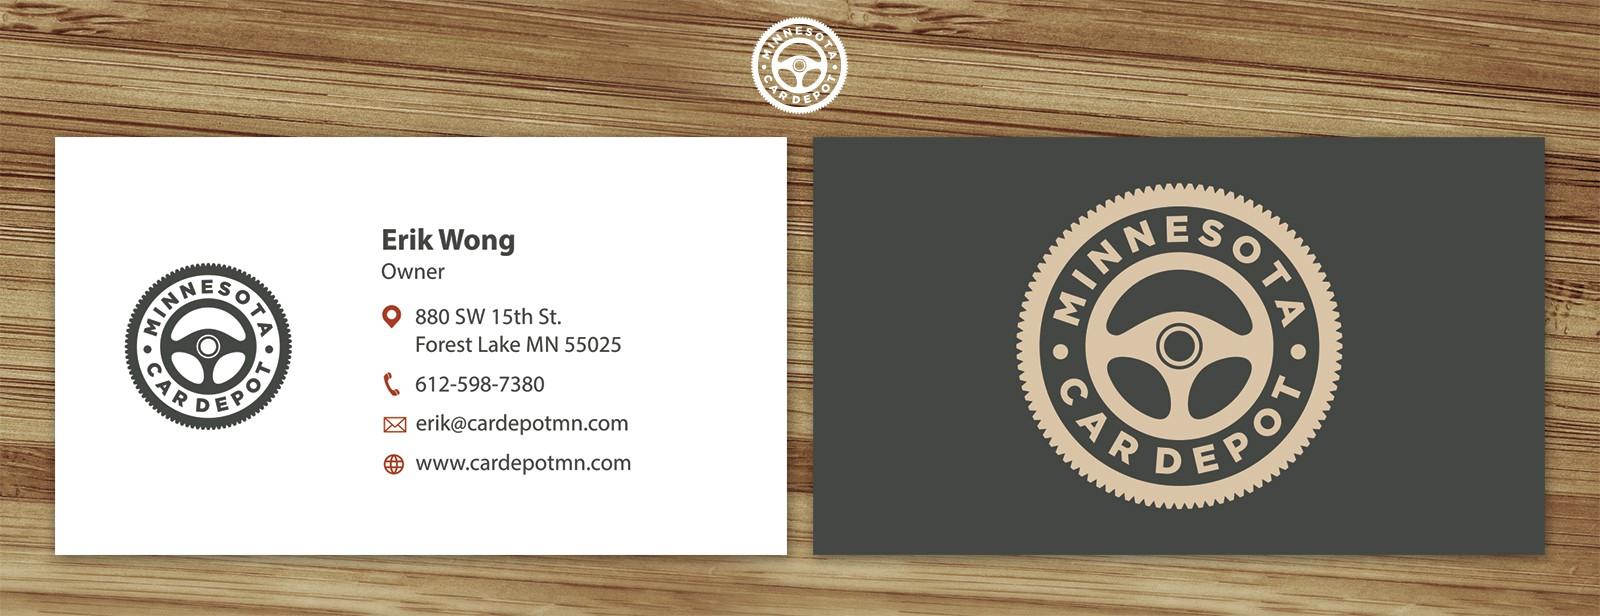 Help us make an awesome car dealership logo for Minnesota Car Depot